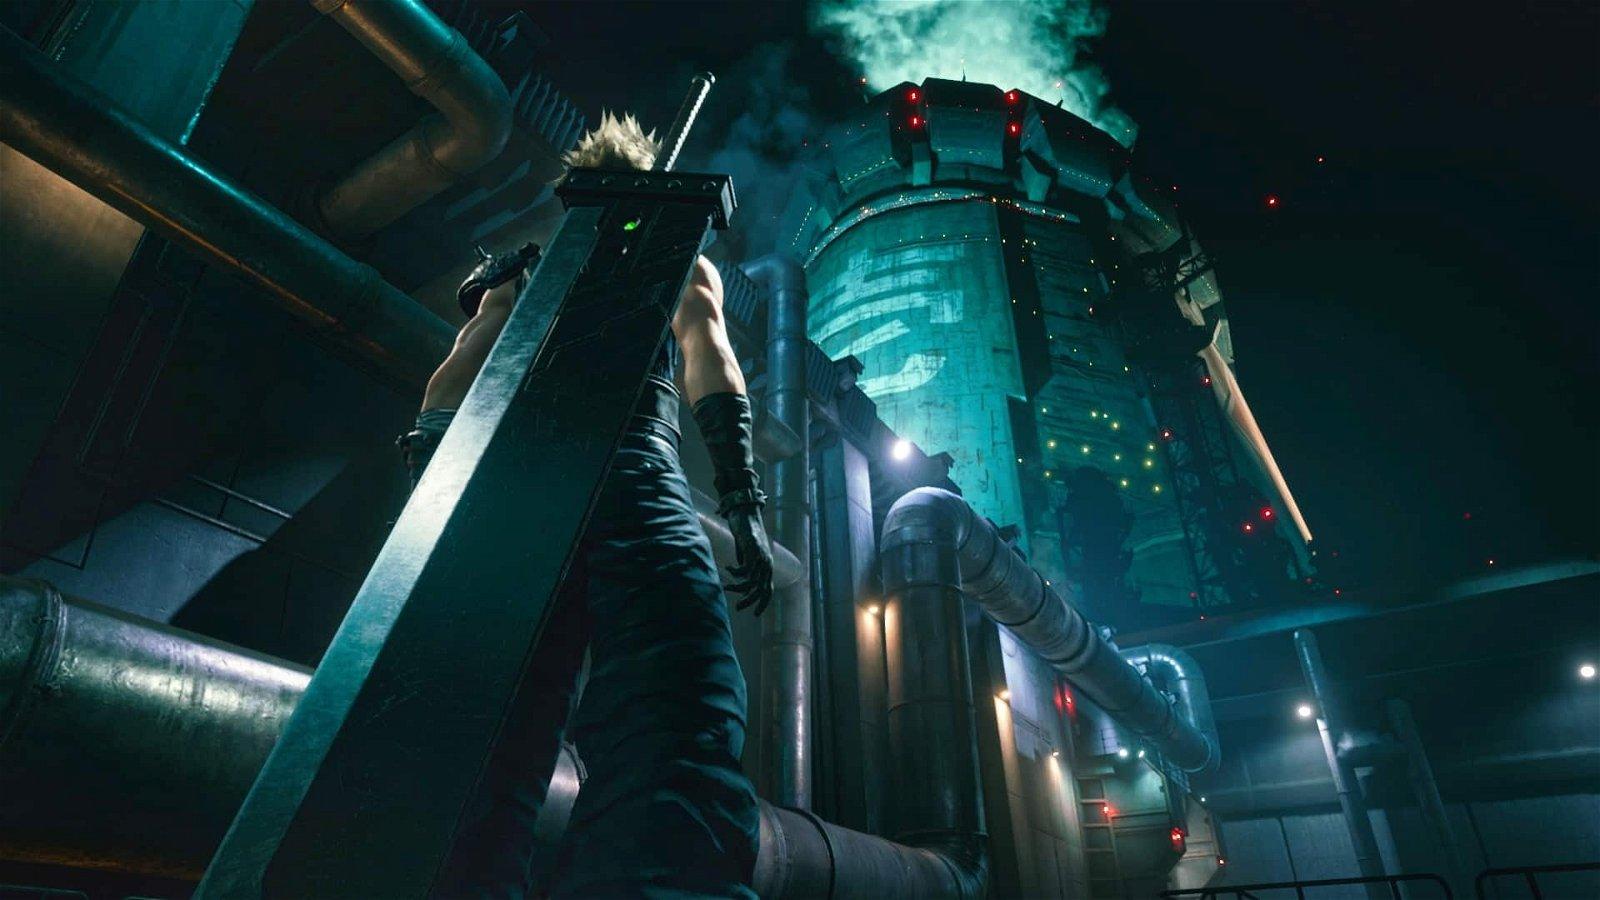 Final Fantasy VII Remake Brings Midgar to Life: Hands-on Preview 4